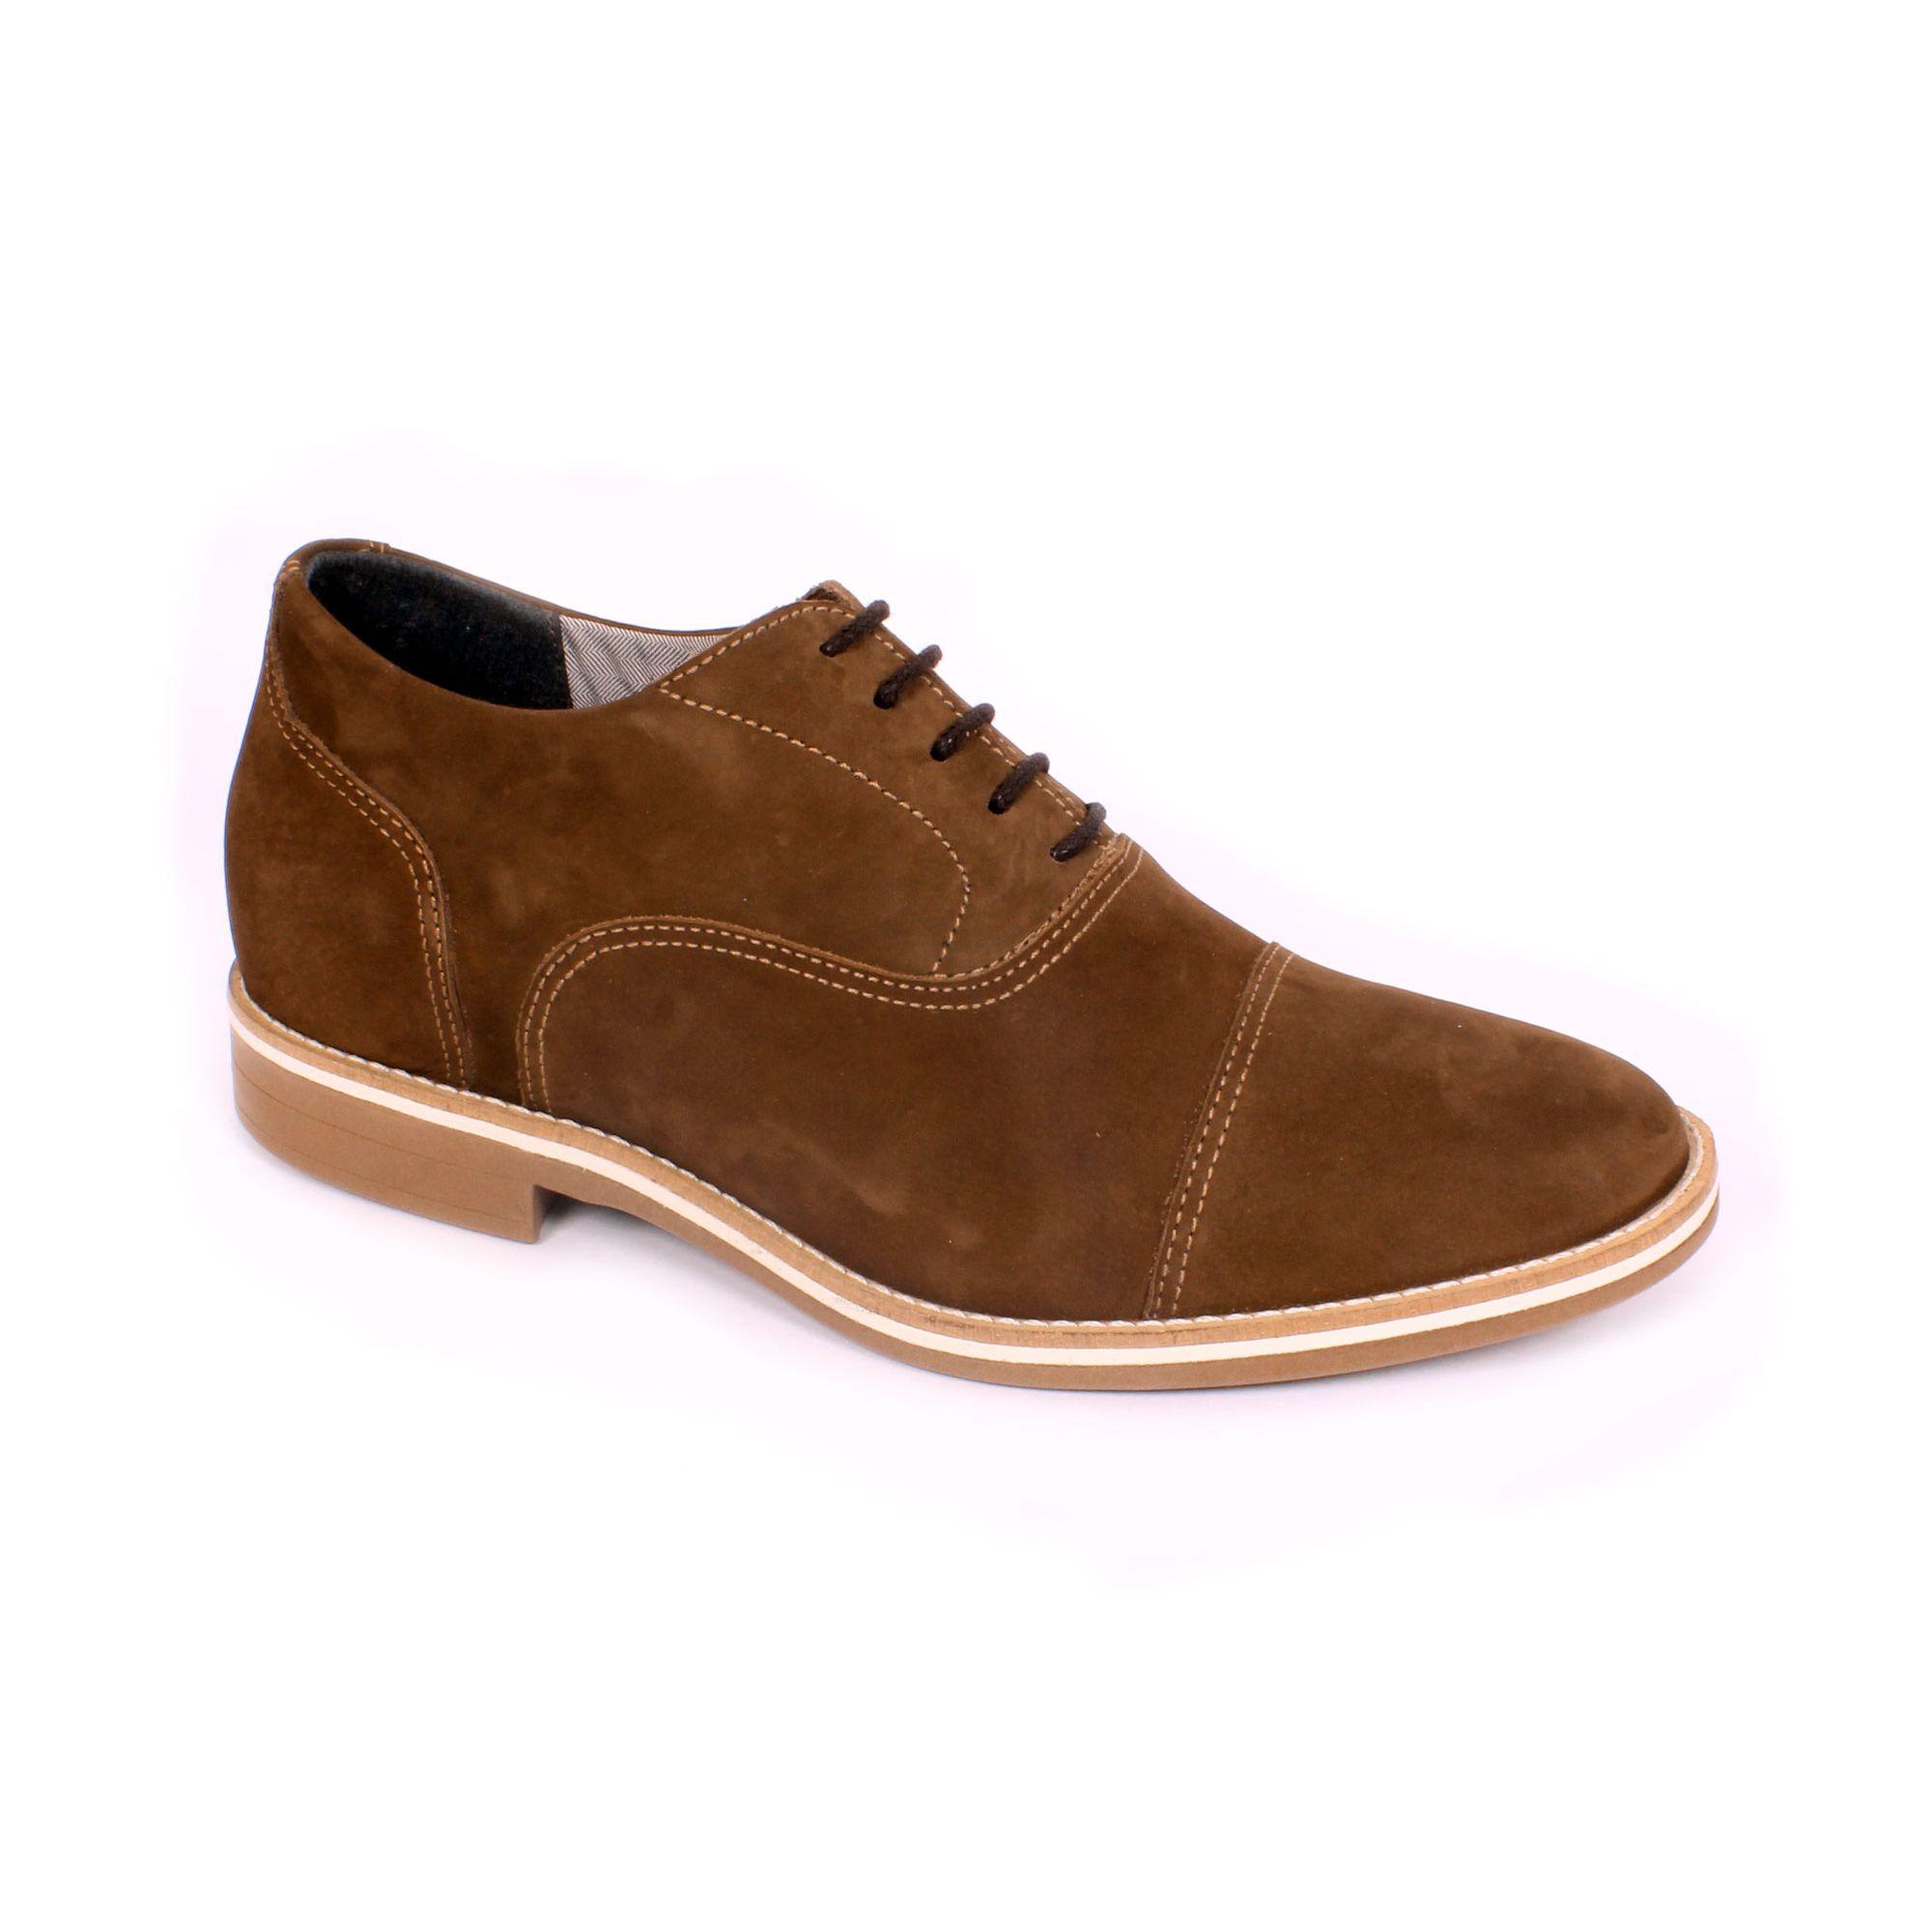 Zapato Casual Hippie Café Max Denegri +7cm de Altura_70870